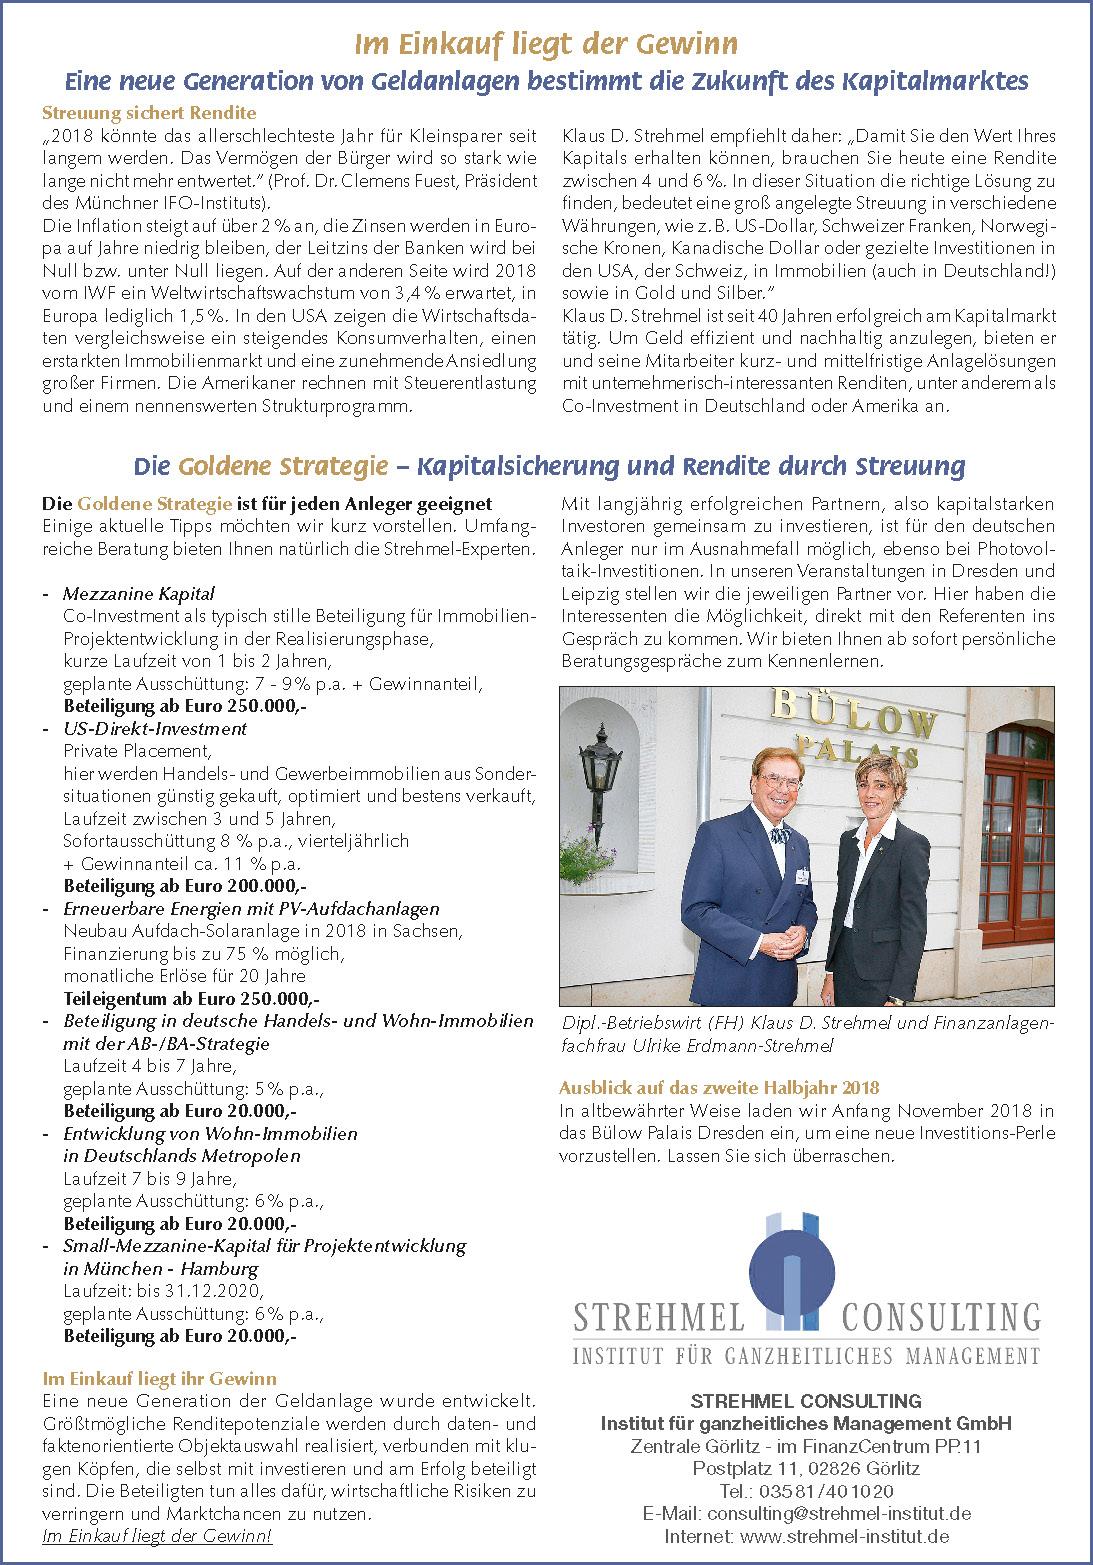 Strehmel Consulting